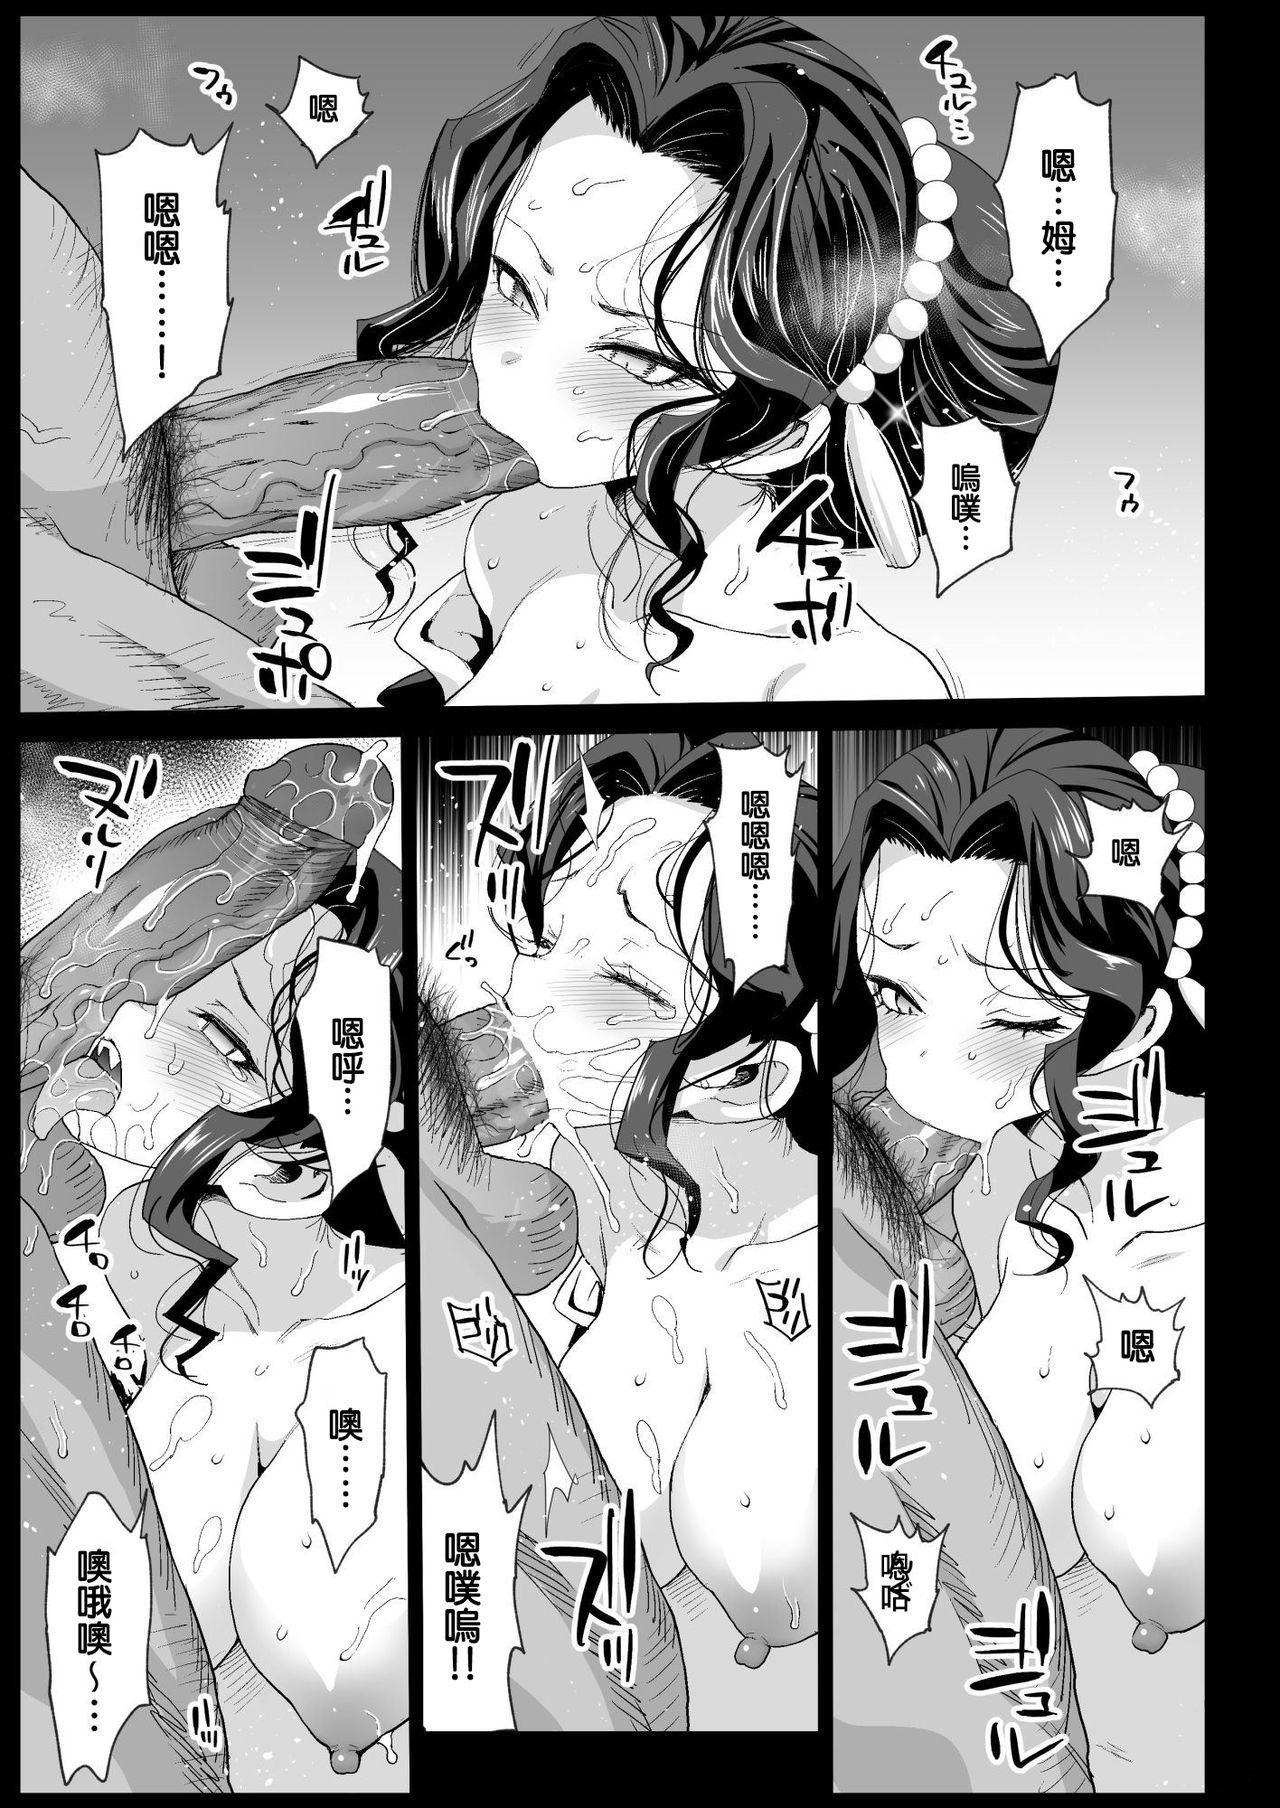 Eromazun (Ma-kurou)] Mesu Ochi Jou Muzan-sama - RAPE OF DEMON SLAYER 4 (Kimetsu no Yaiba) [Chinese] [瑞树汉化组&BW重嵌] [Decensored] [Digital] 19